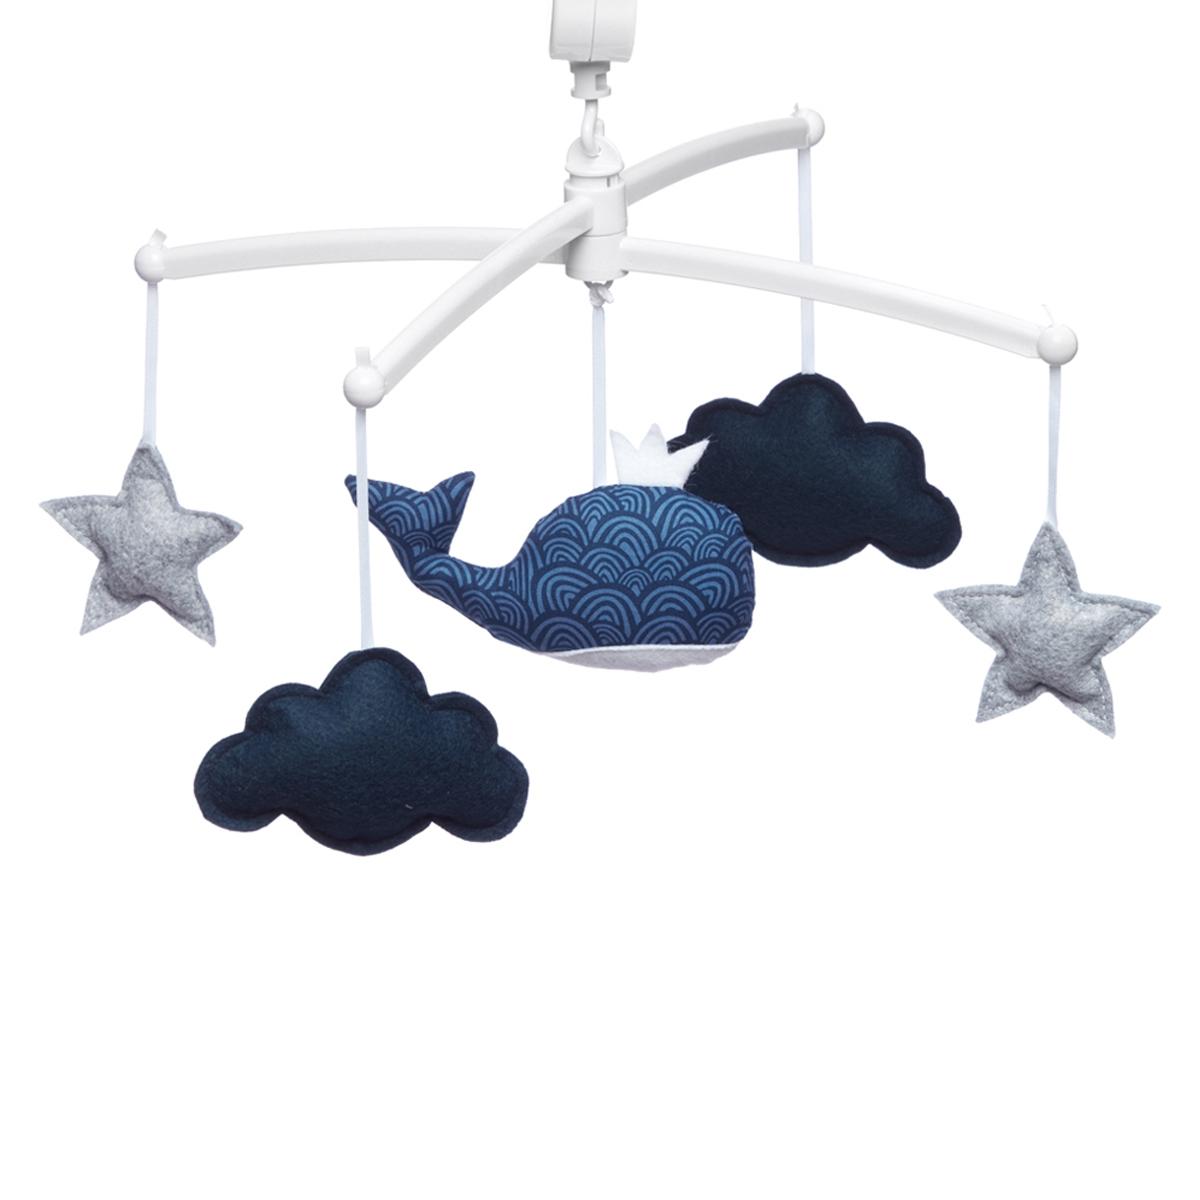 Mobile Mobile Musical Baleine - Bleu Marine et Gris